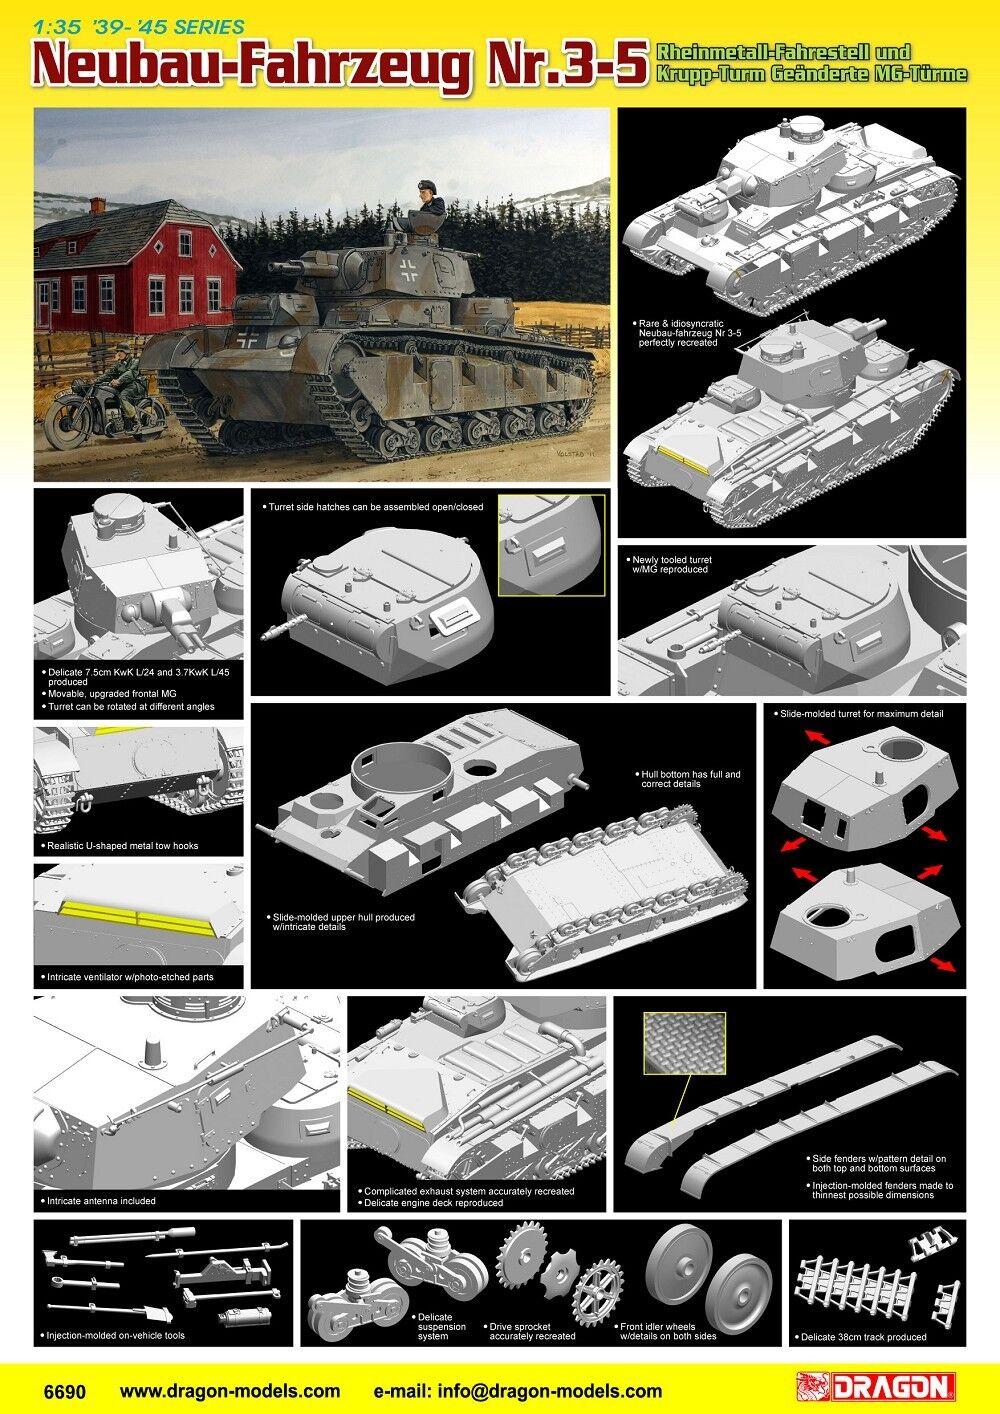 Dragon 1 35 Neuba Fahrzeug Nr.3-5 Plastic Model Kit